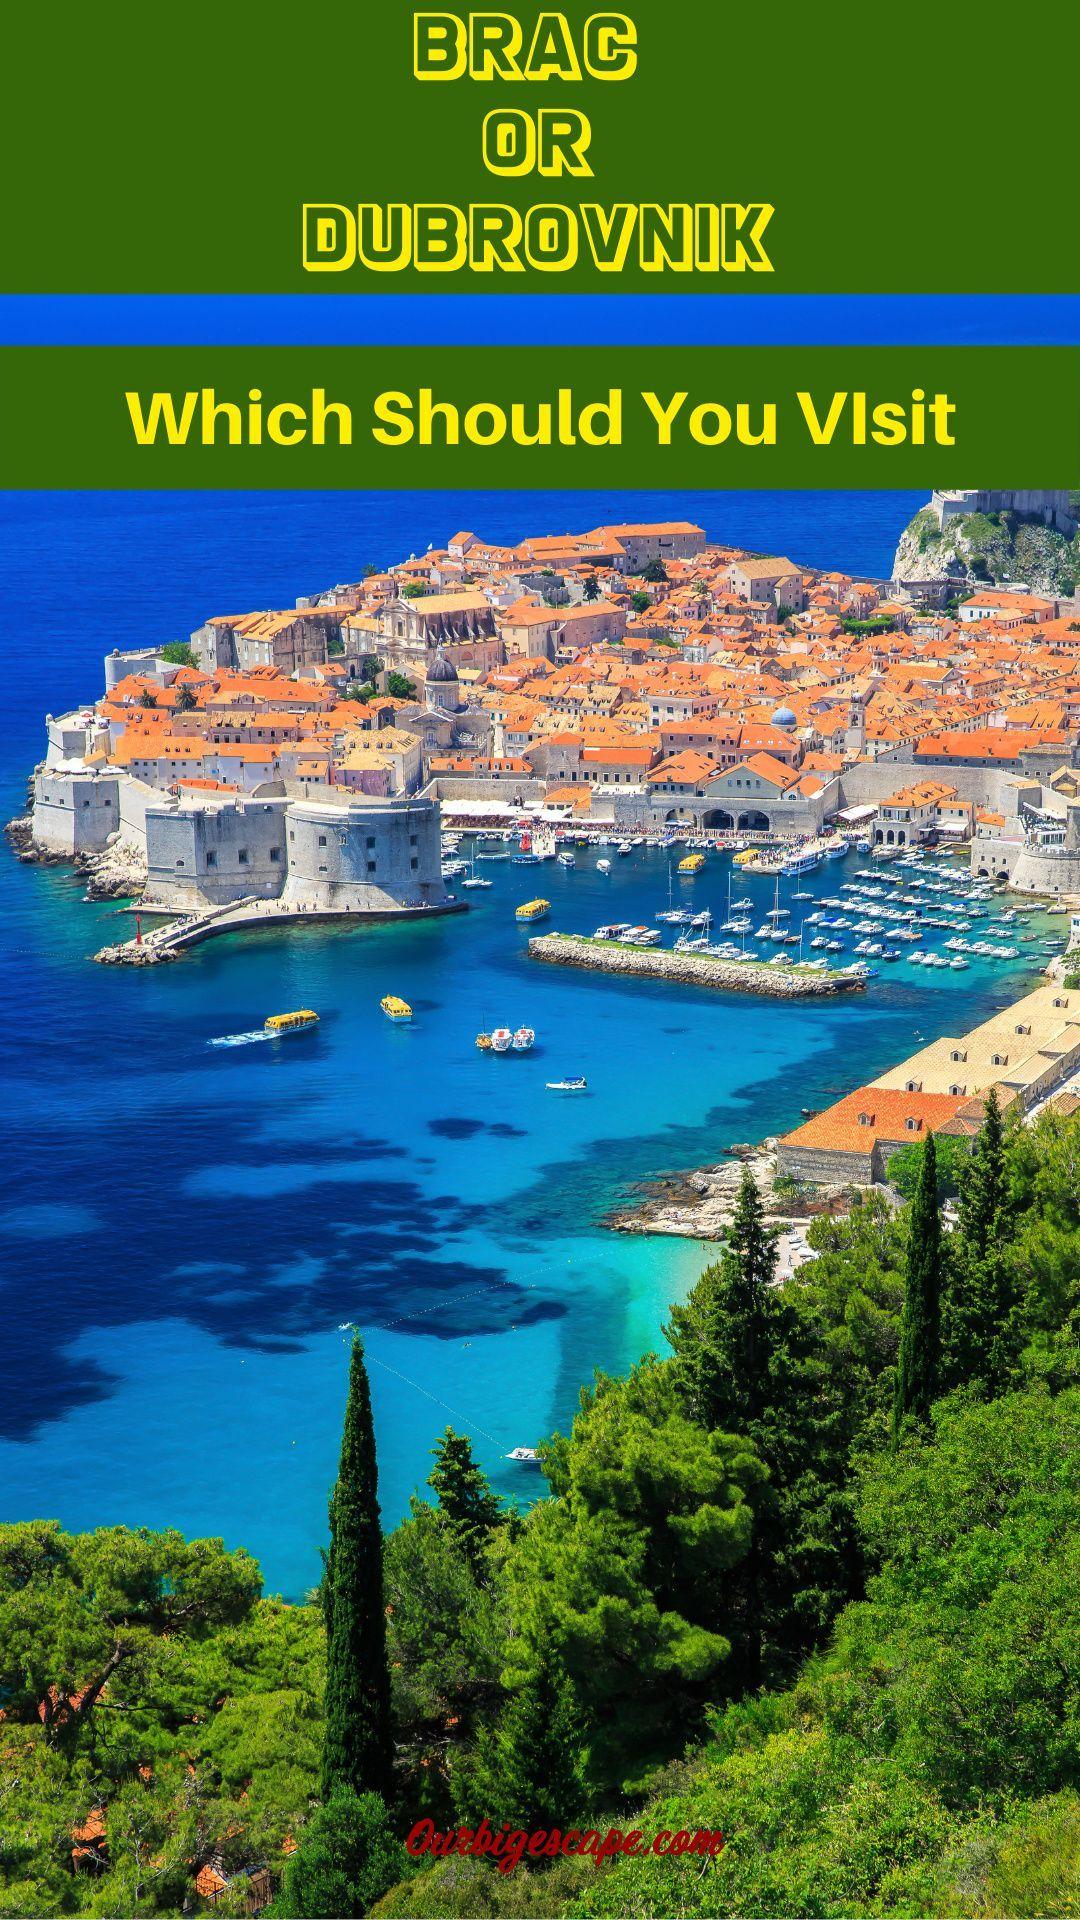 Map Of The Route For Croatia Adventure Zagreb To Dubrovnik Croatia Croatia Itinerary Croatia Travel